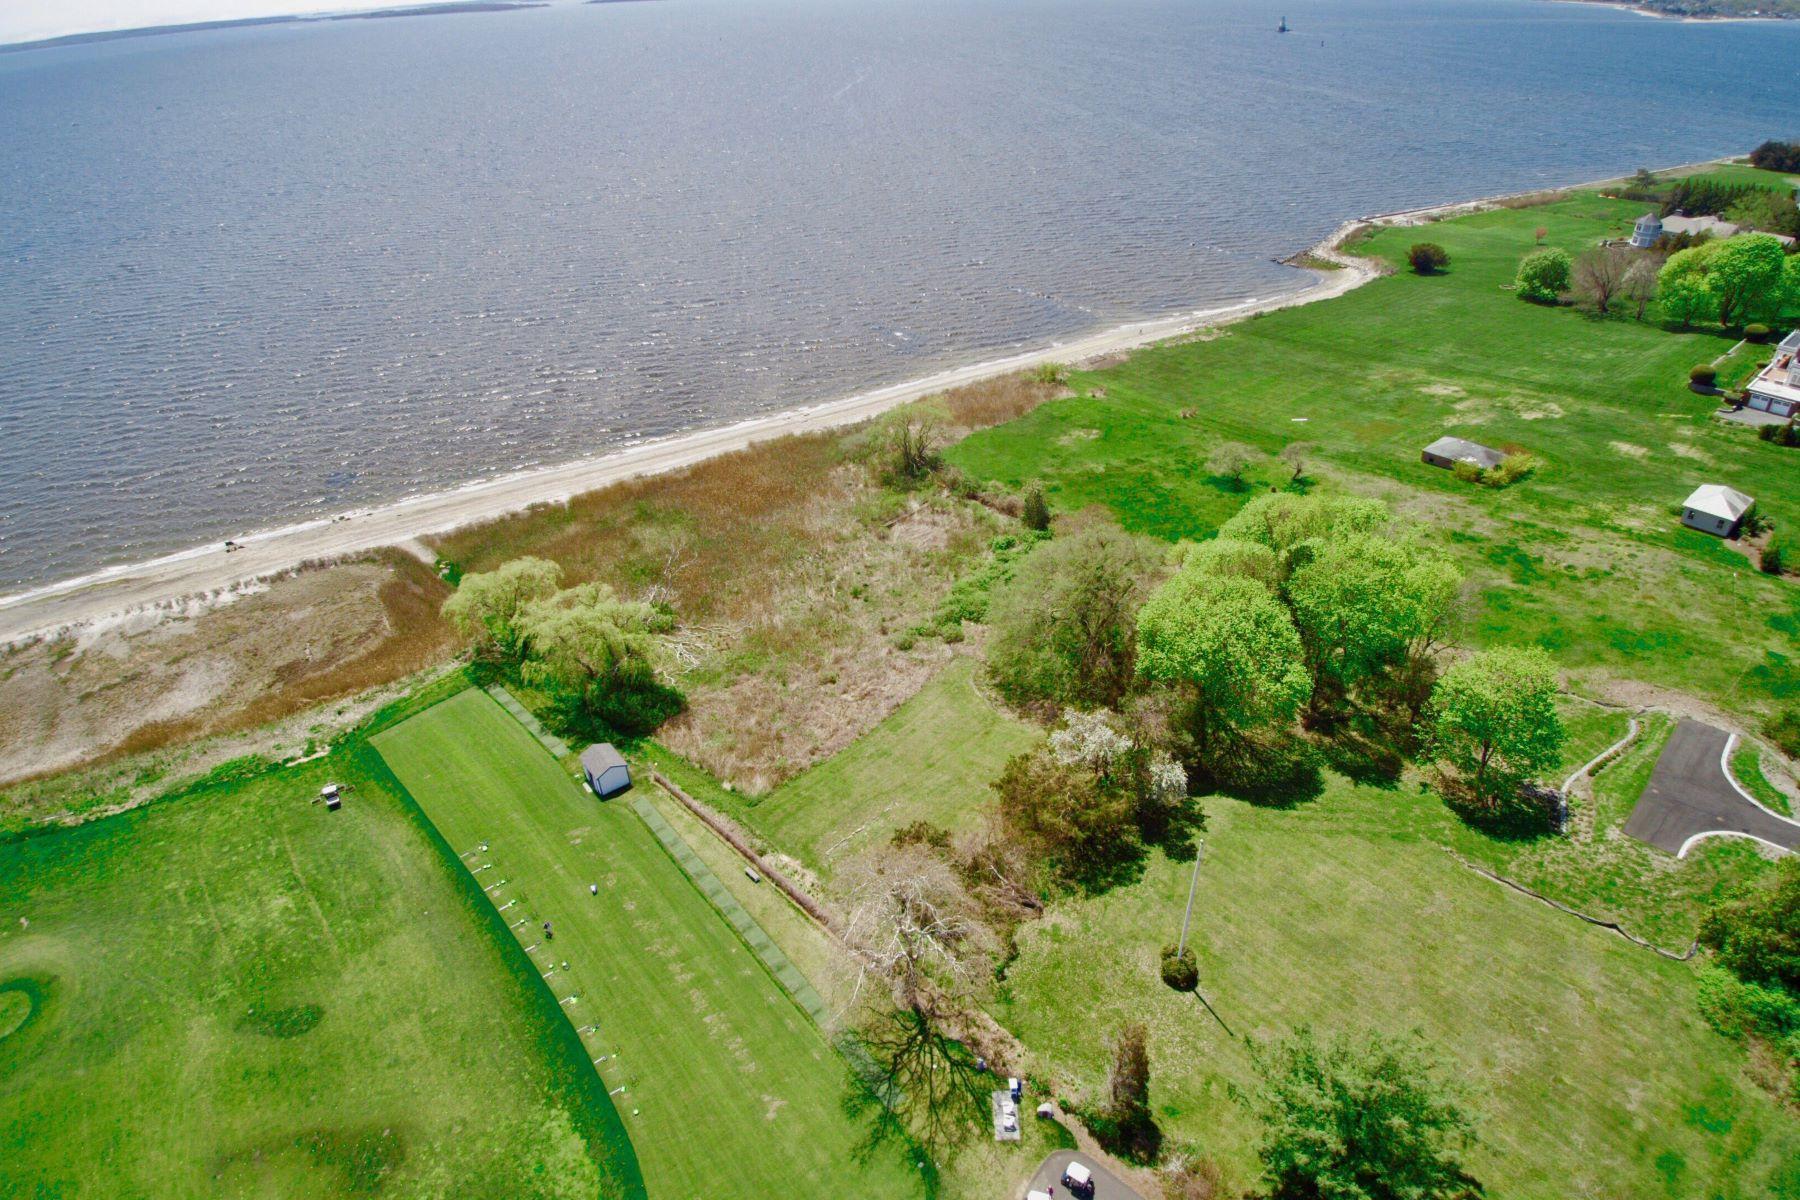 Land for Sale at 0 Nayatt Road, Barrington, RI Barrington, Rhode Island 02806 United States